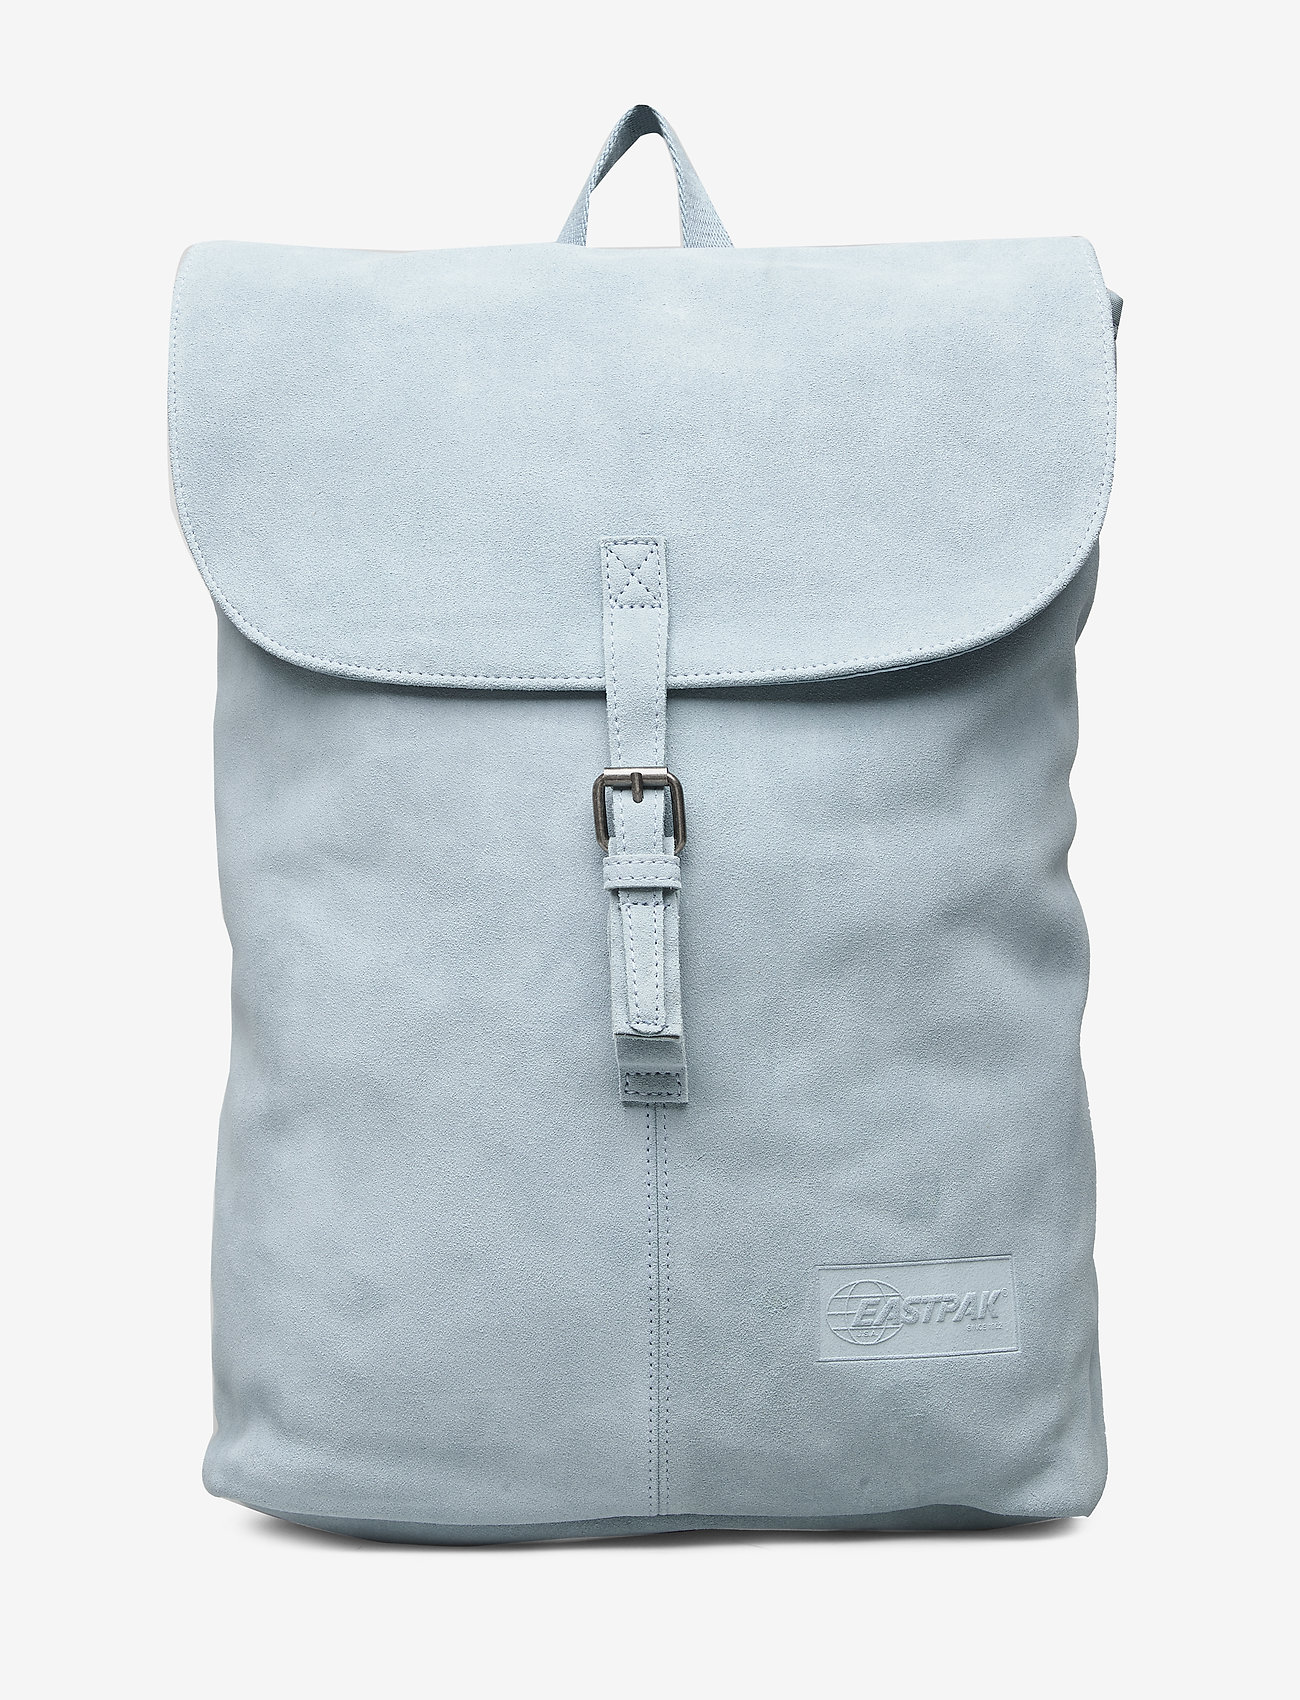 Eastpak - CIERA - rucksäcke - suede blue - 0